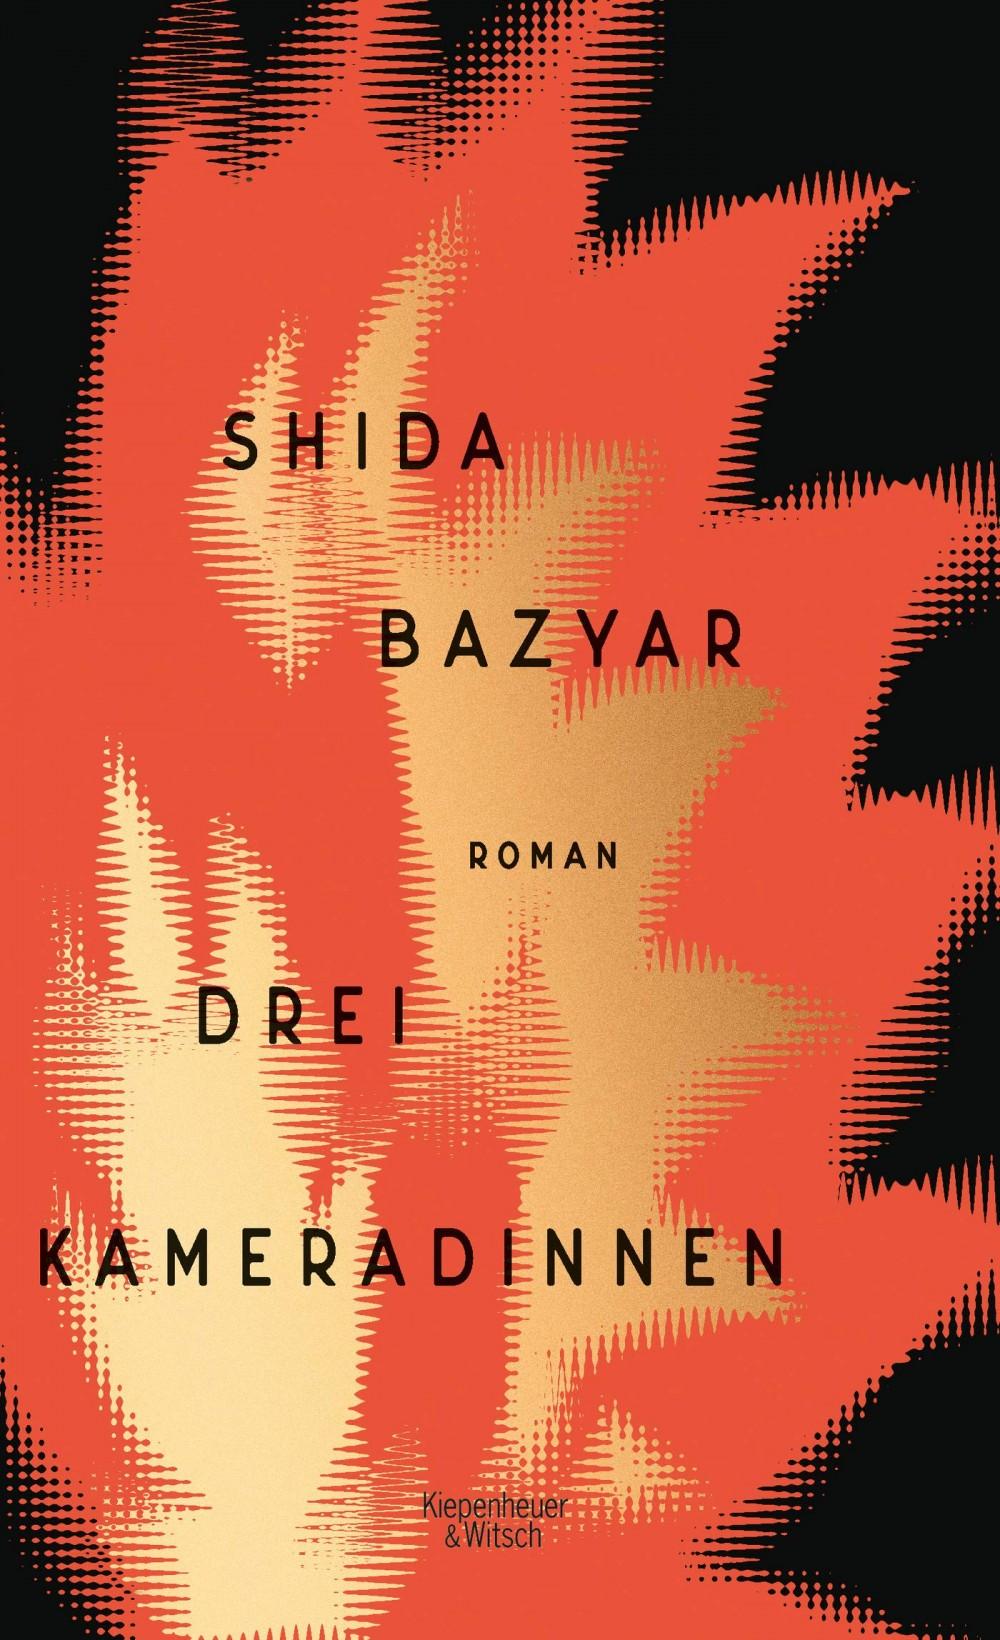 Shida Bazyar, Drei Kameradinnen